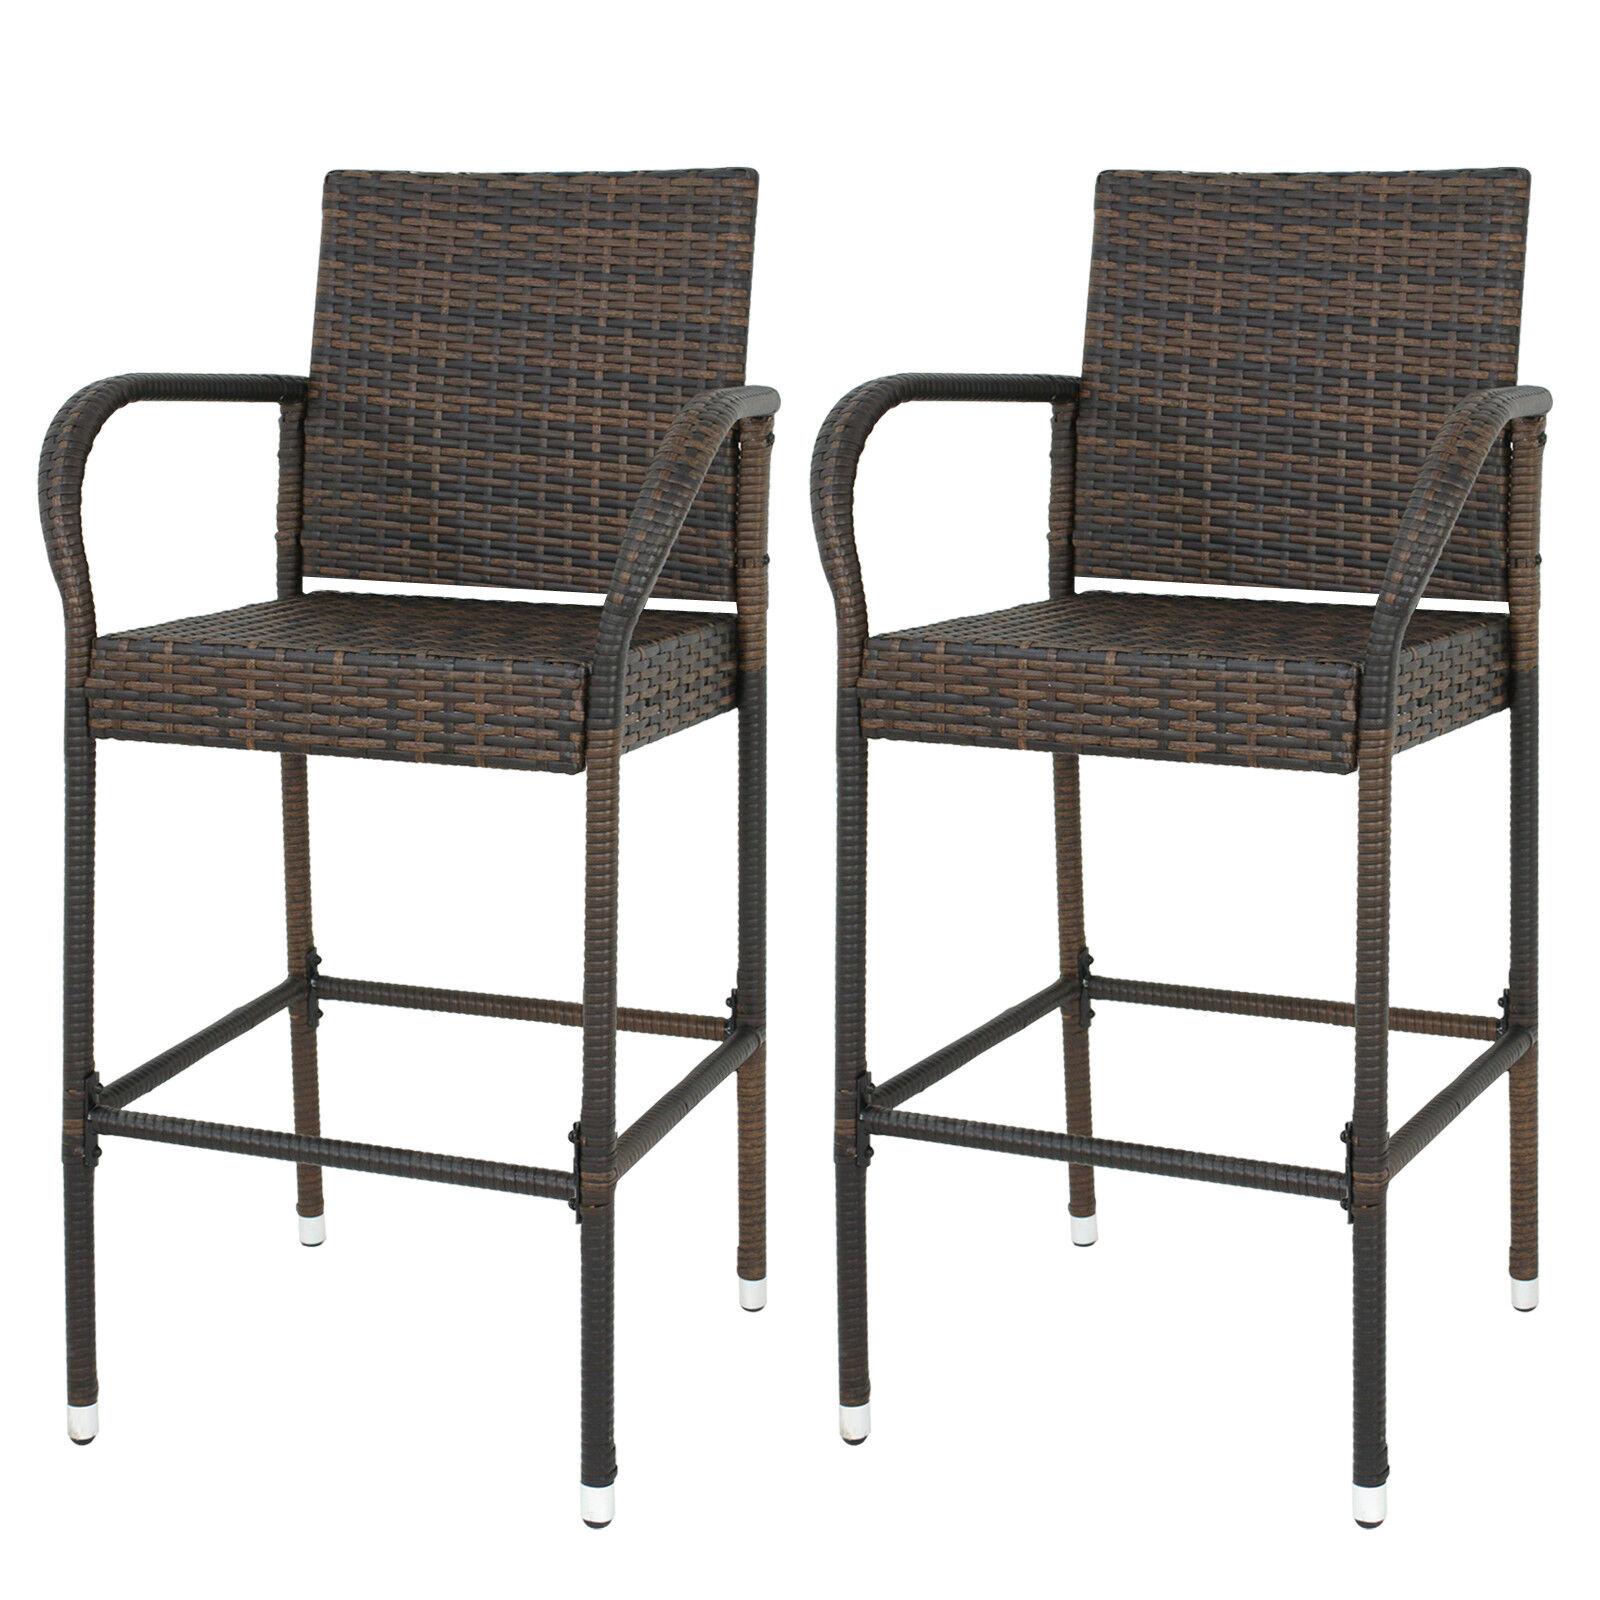 Set Of 2 Wicker Bar Chair W/ Adjustable Cool Bar Ice Bucket Backyard Outdoor Home & Garden